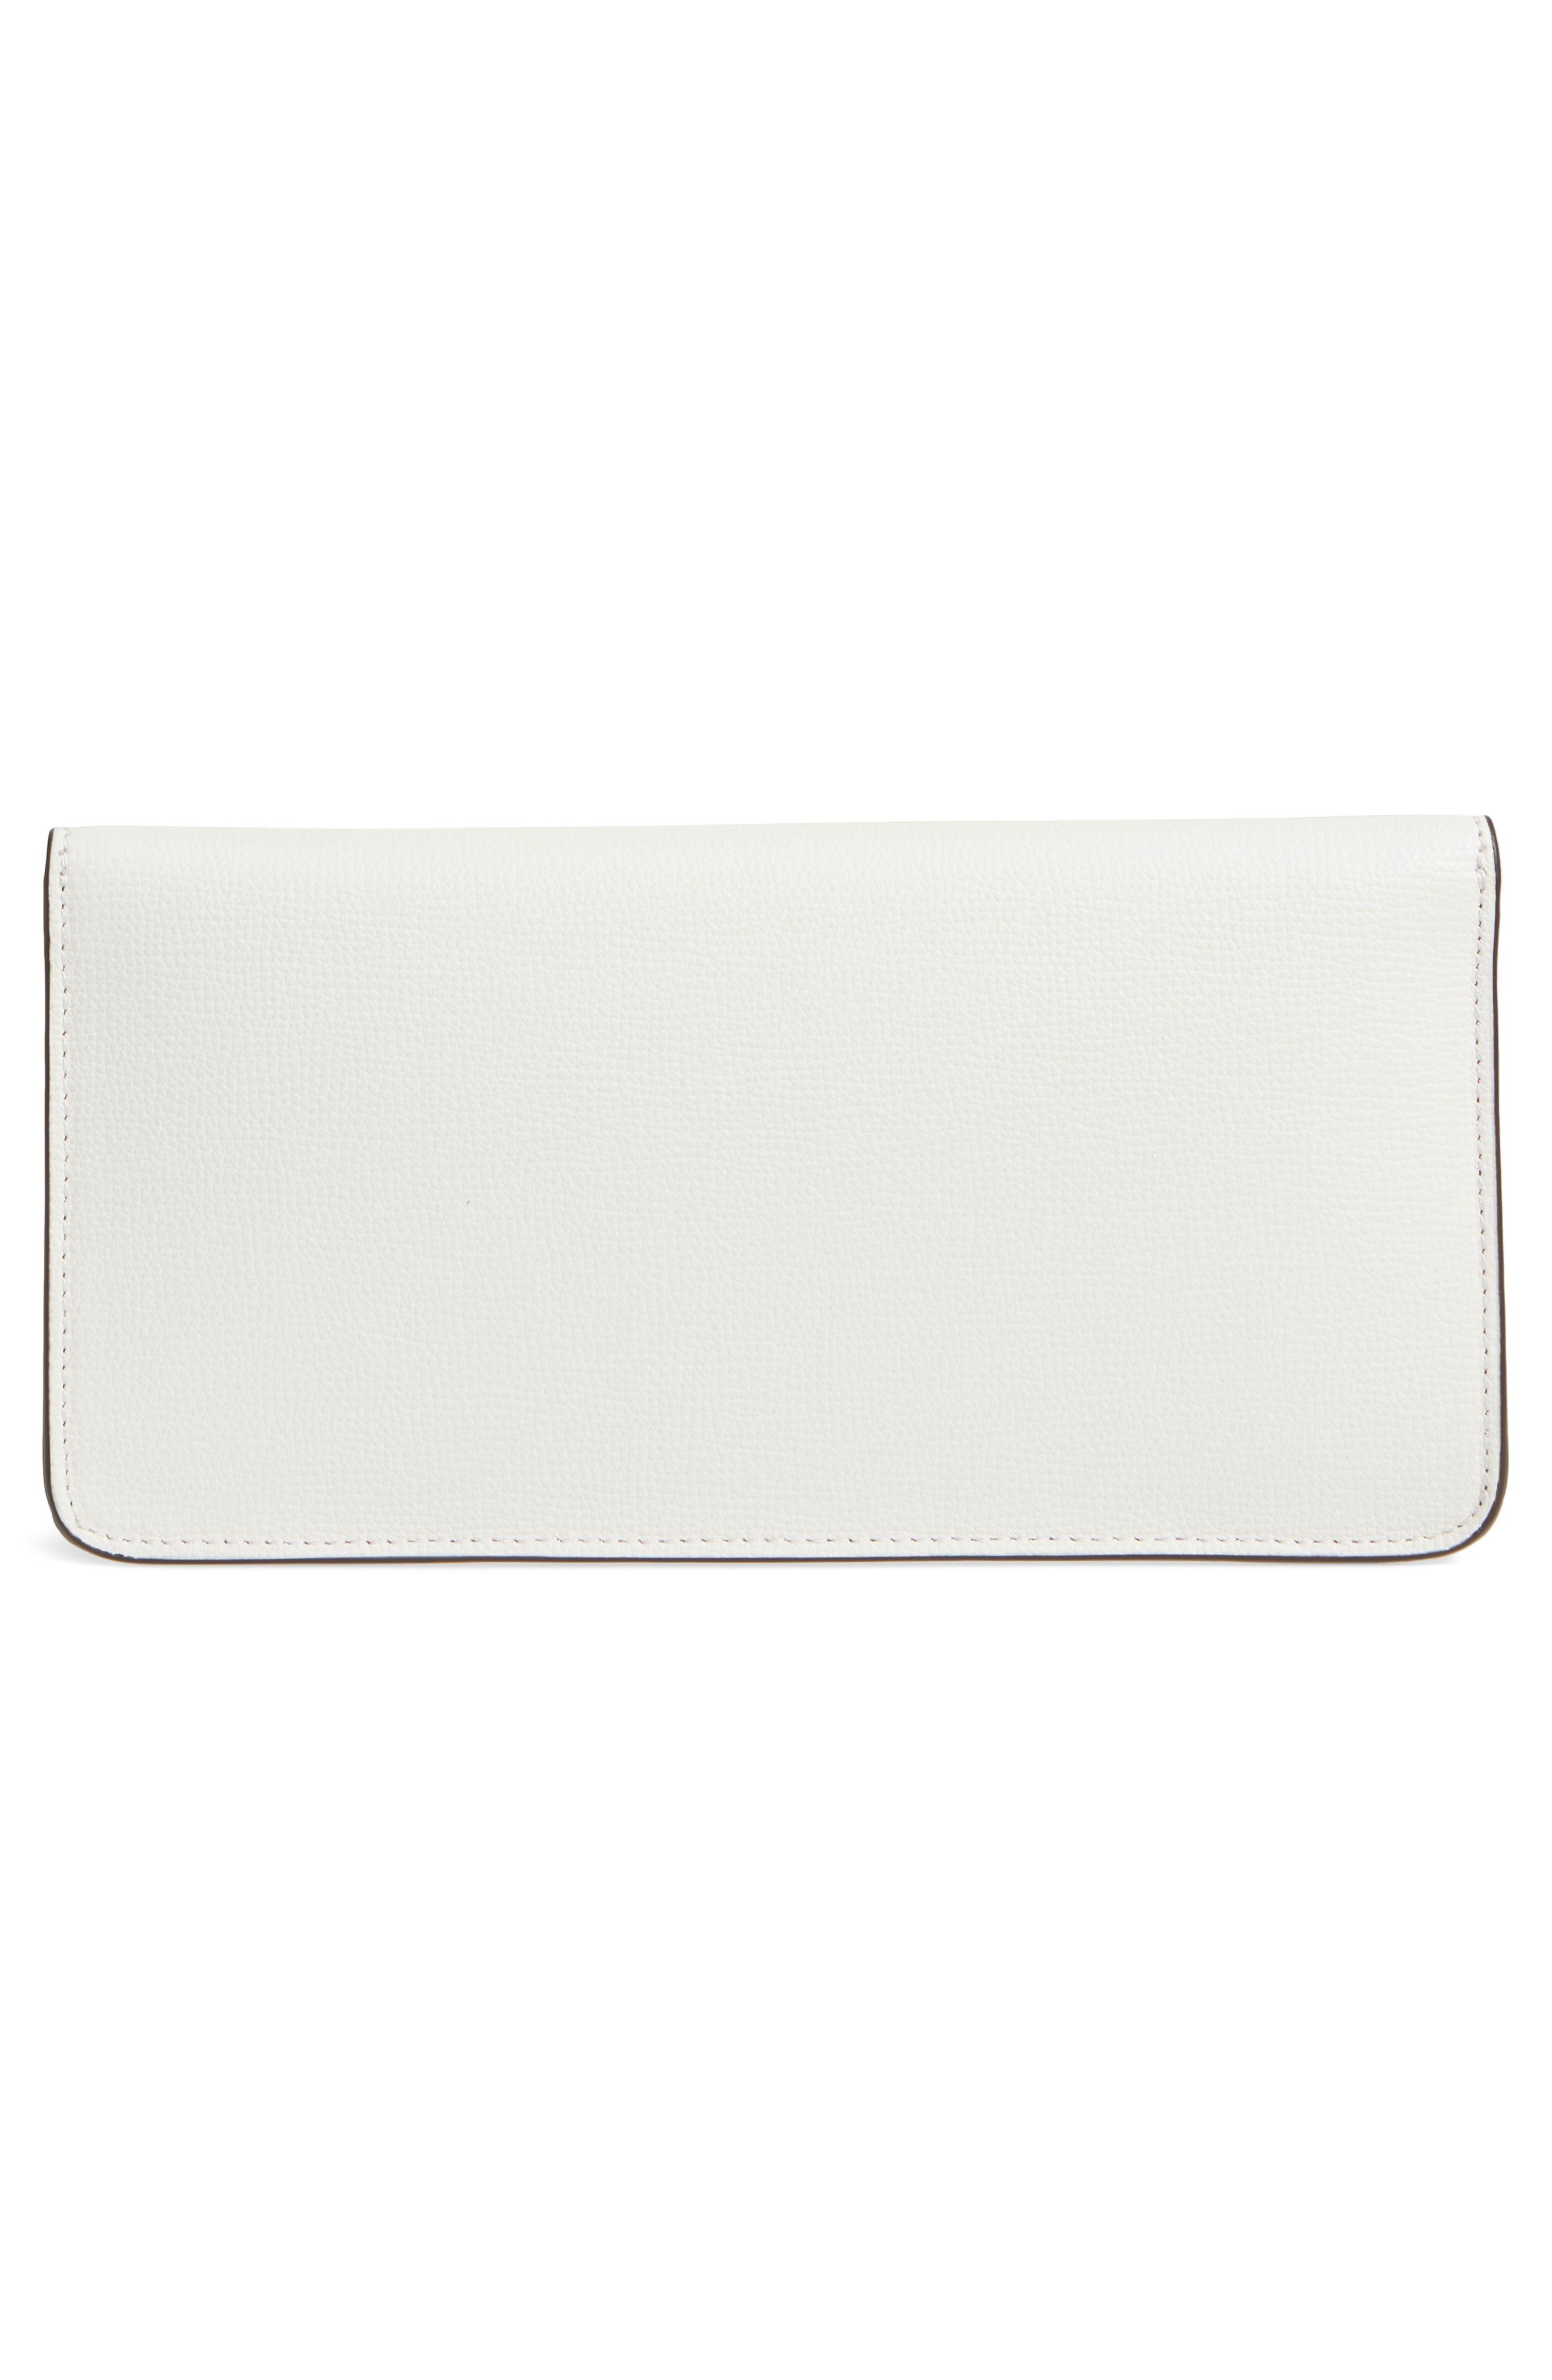 Kira Leather Envelope Clutch,                             Alternate thumbnail 3, color,                             BIRCH